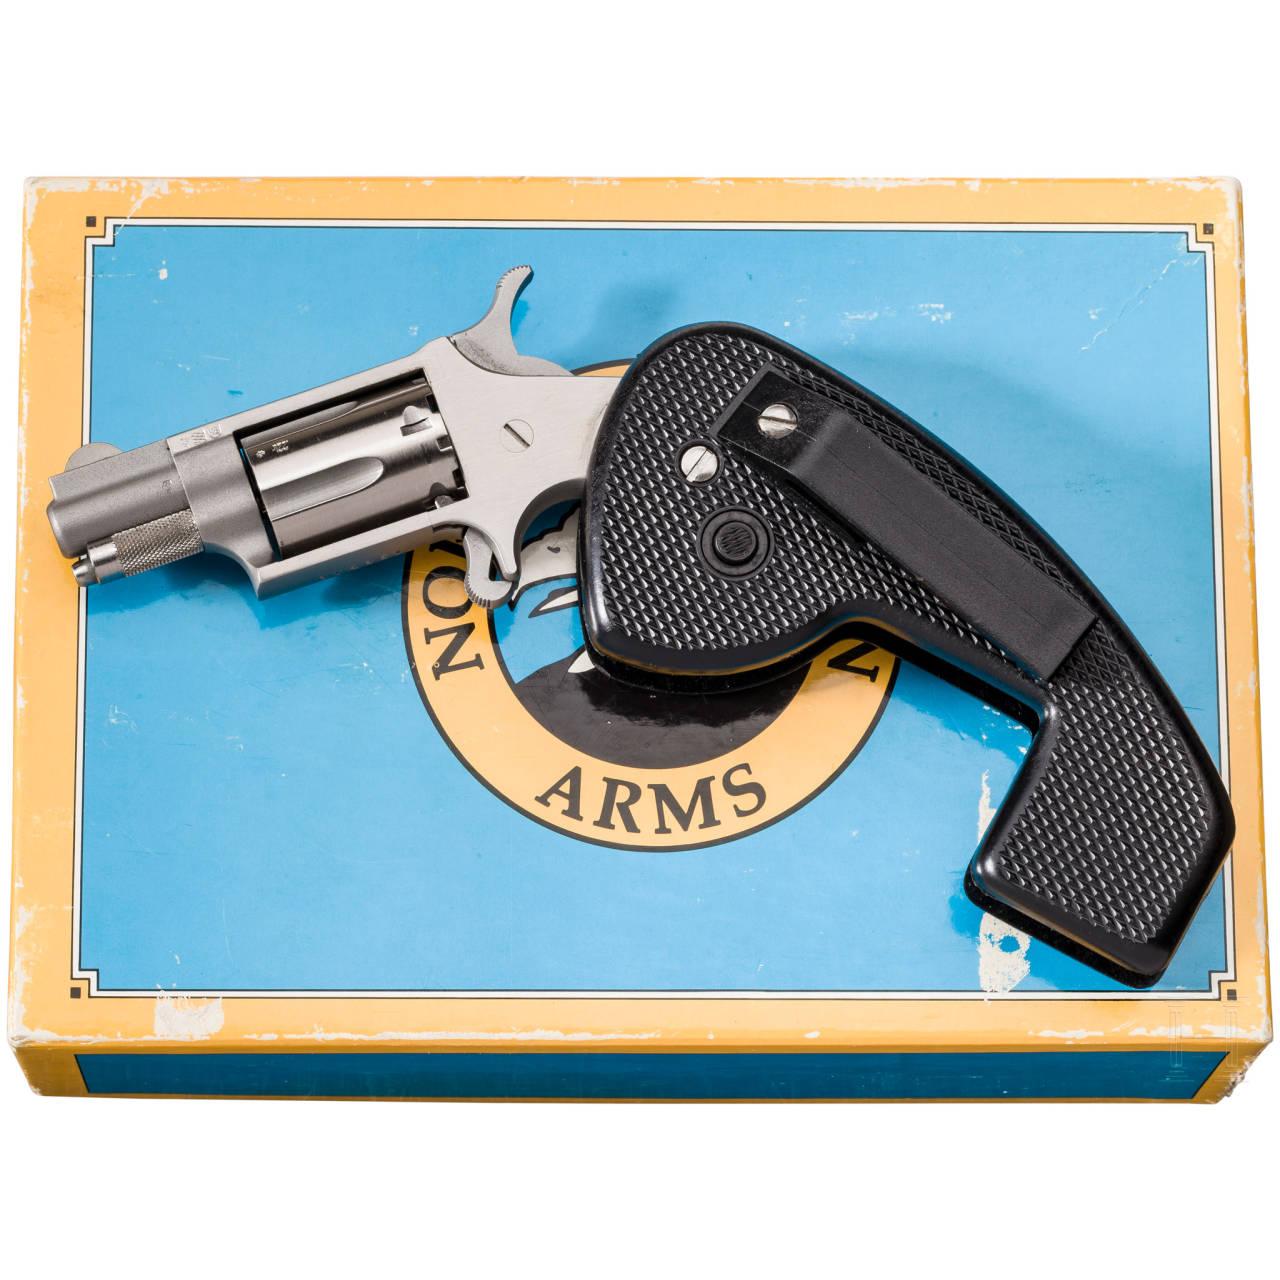 North American Arms Mini Revolver, NAA-22HG/LR, im Karton